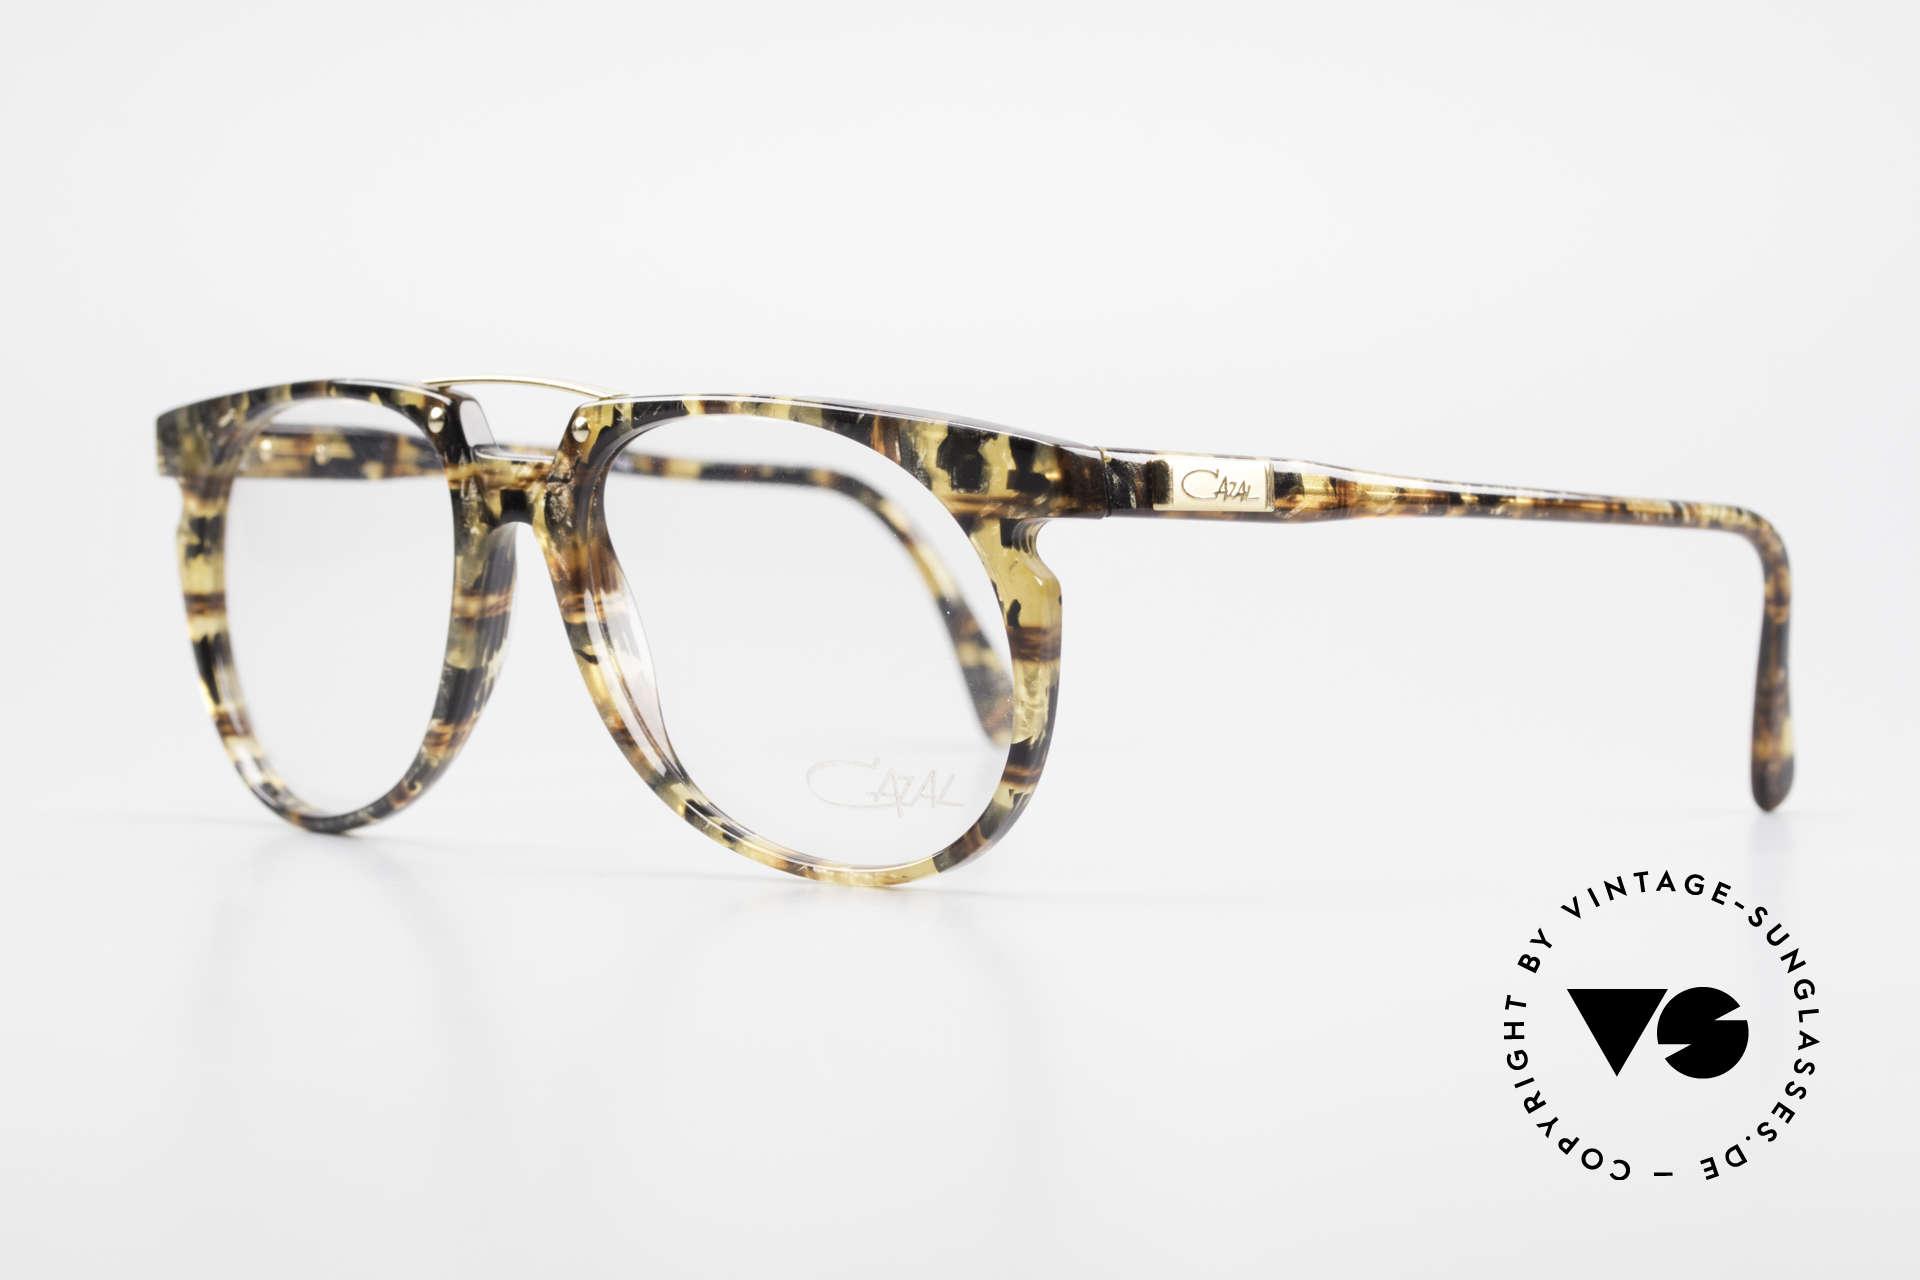 Cazal 645 Extraordinary Vintage Frame, great frame color / pattern (a kind of amber-gold), Made for Men